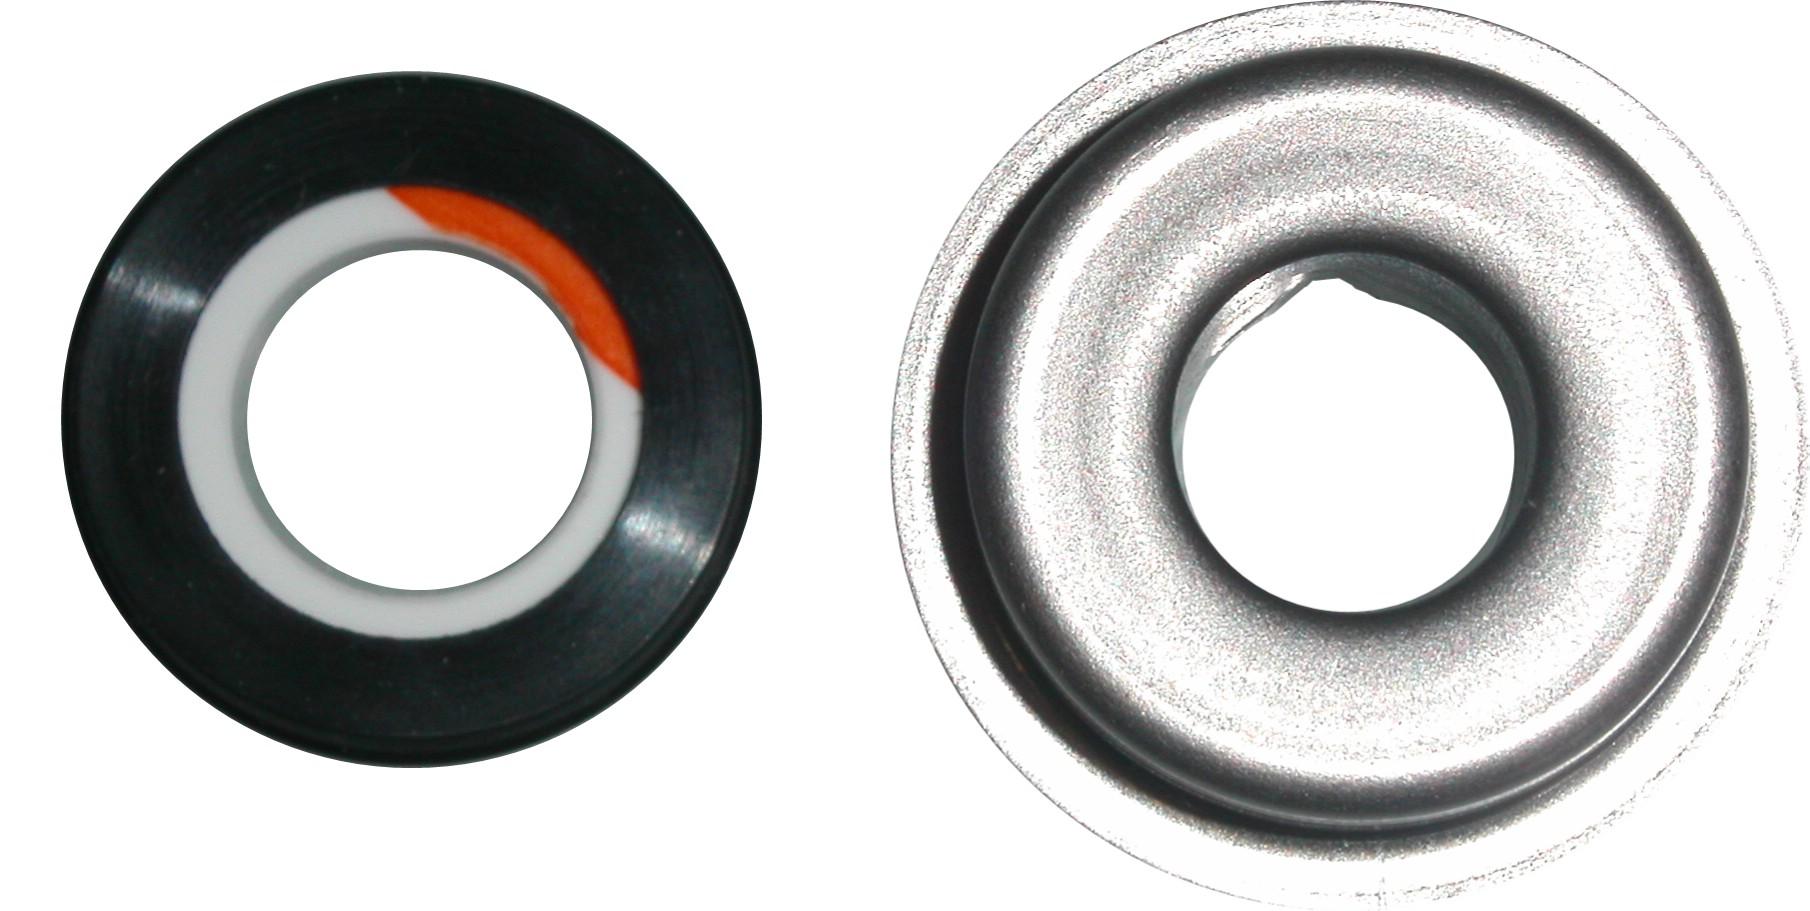 - Water Pump Oil Seal 650 CC 1997 Kawasaki KLR 650 KL650C3